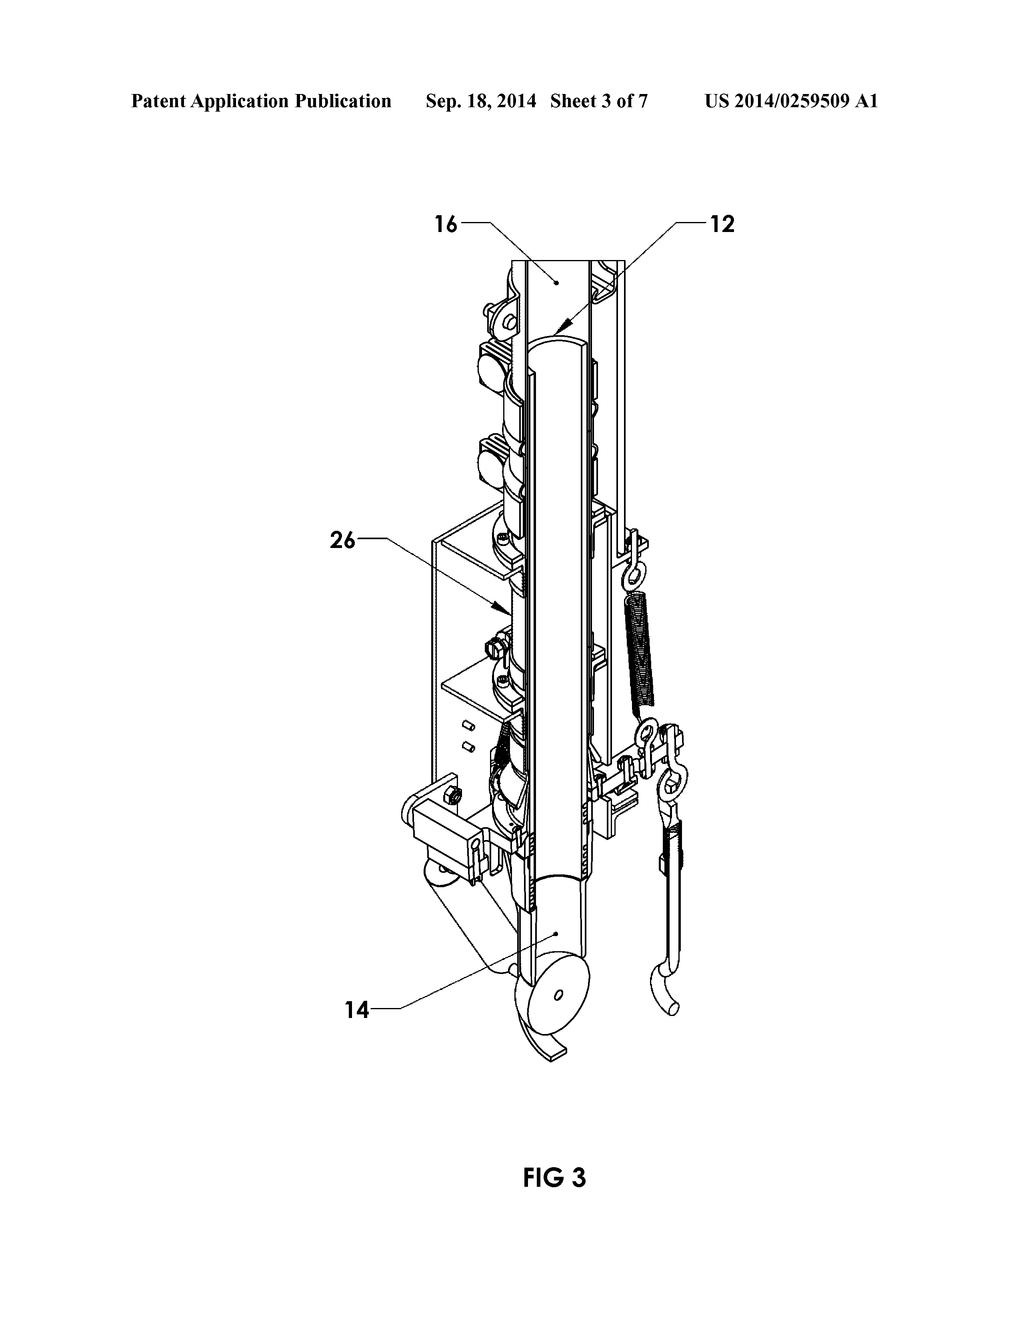 Central Vacuum Wiring